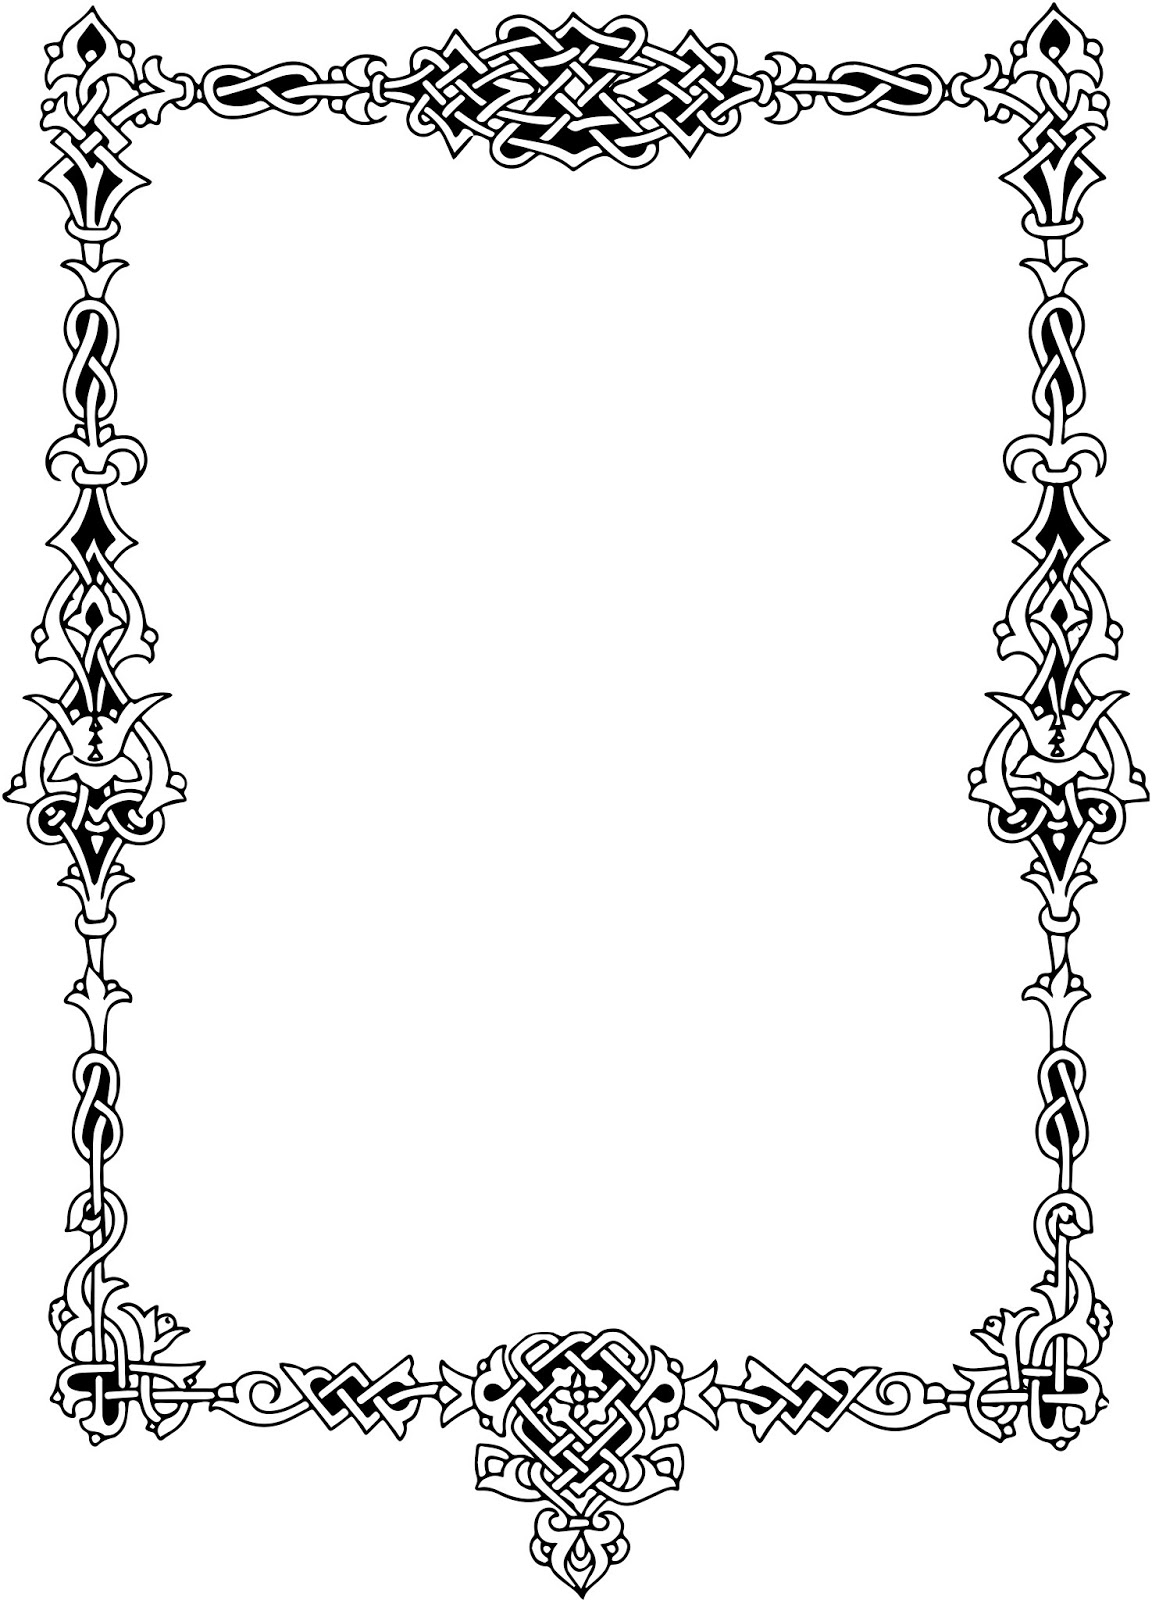 Celtic Knot Border Clip Art